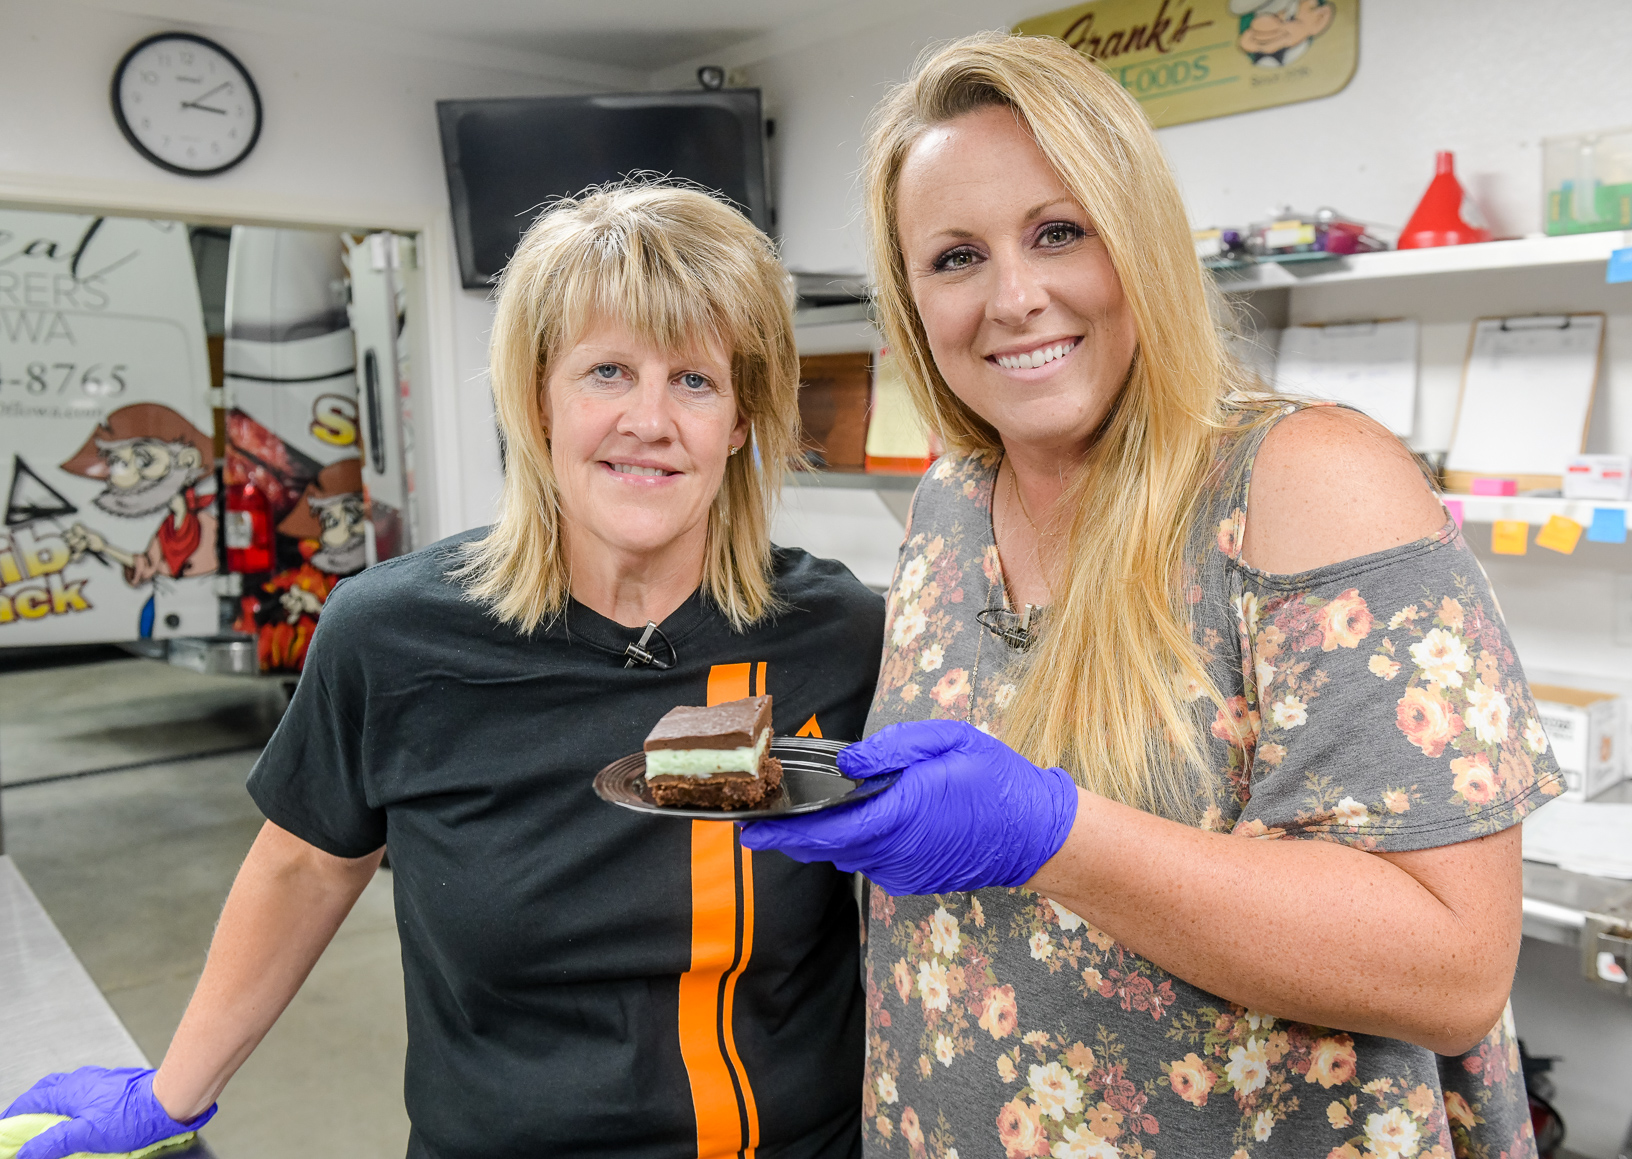 Joni Bell and Cristen Clark dig in to a creme de menthe brownie. hoto credit: Joseph L. Murphy/Iowa Soybean Association